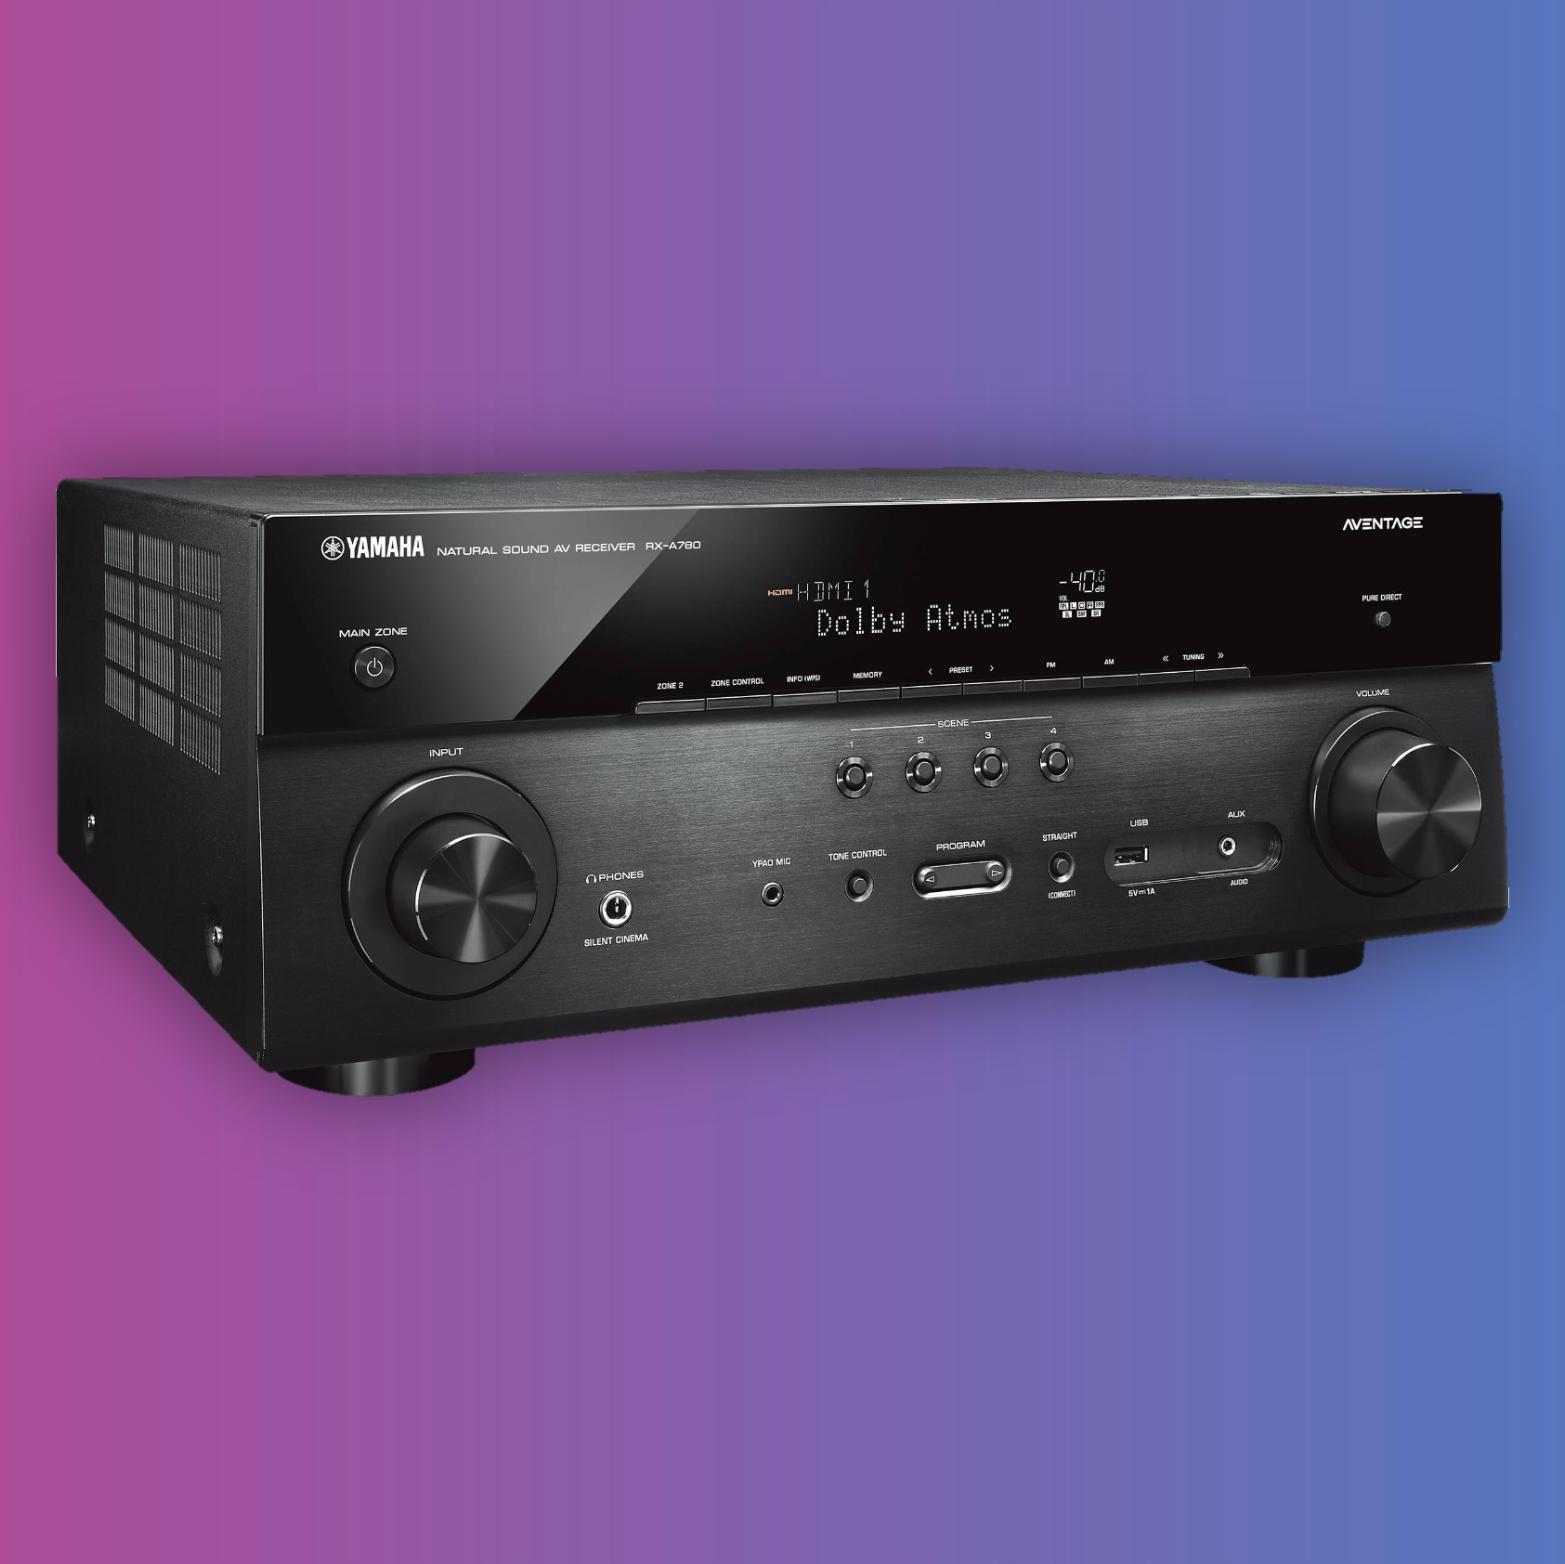 Yamaha RX-A780: AV-Receiver (7-Kanal, 7x 95W/8Ω, MusicCast Multiroom, 7x HDMI)